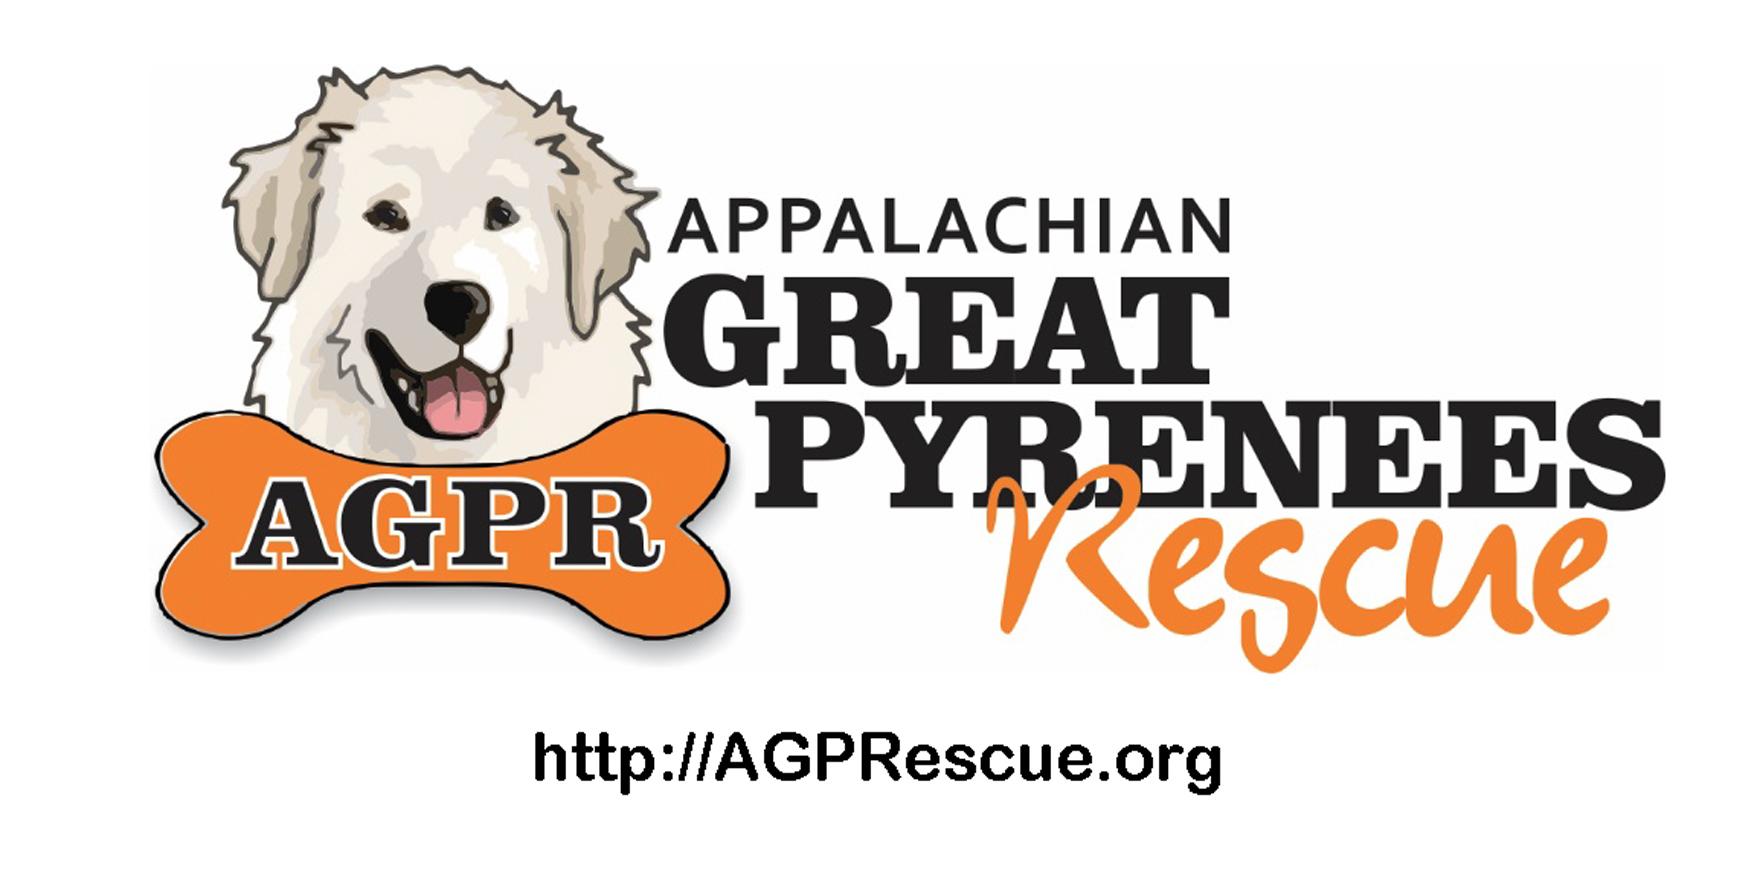 Appalachian Great Pyrenees Rescue